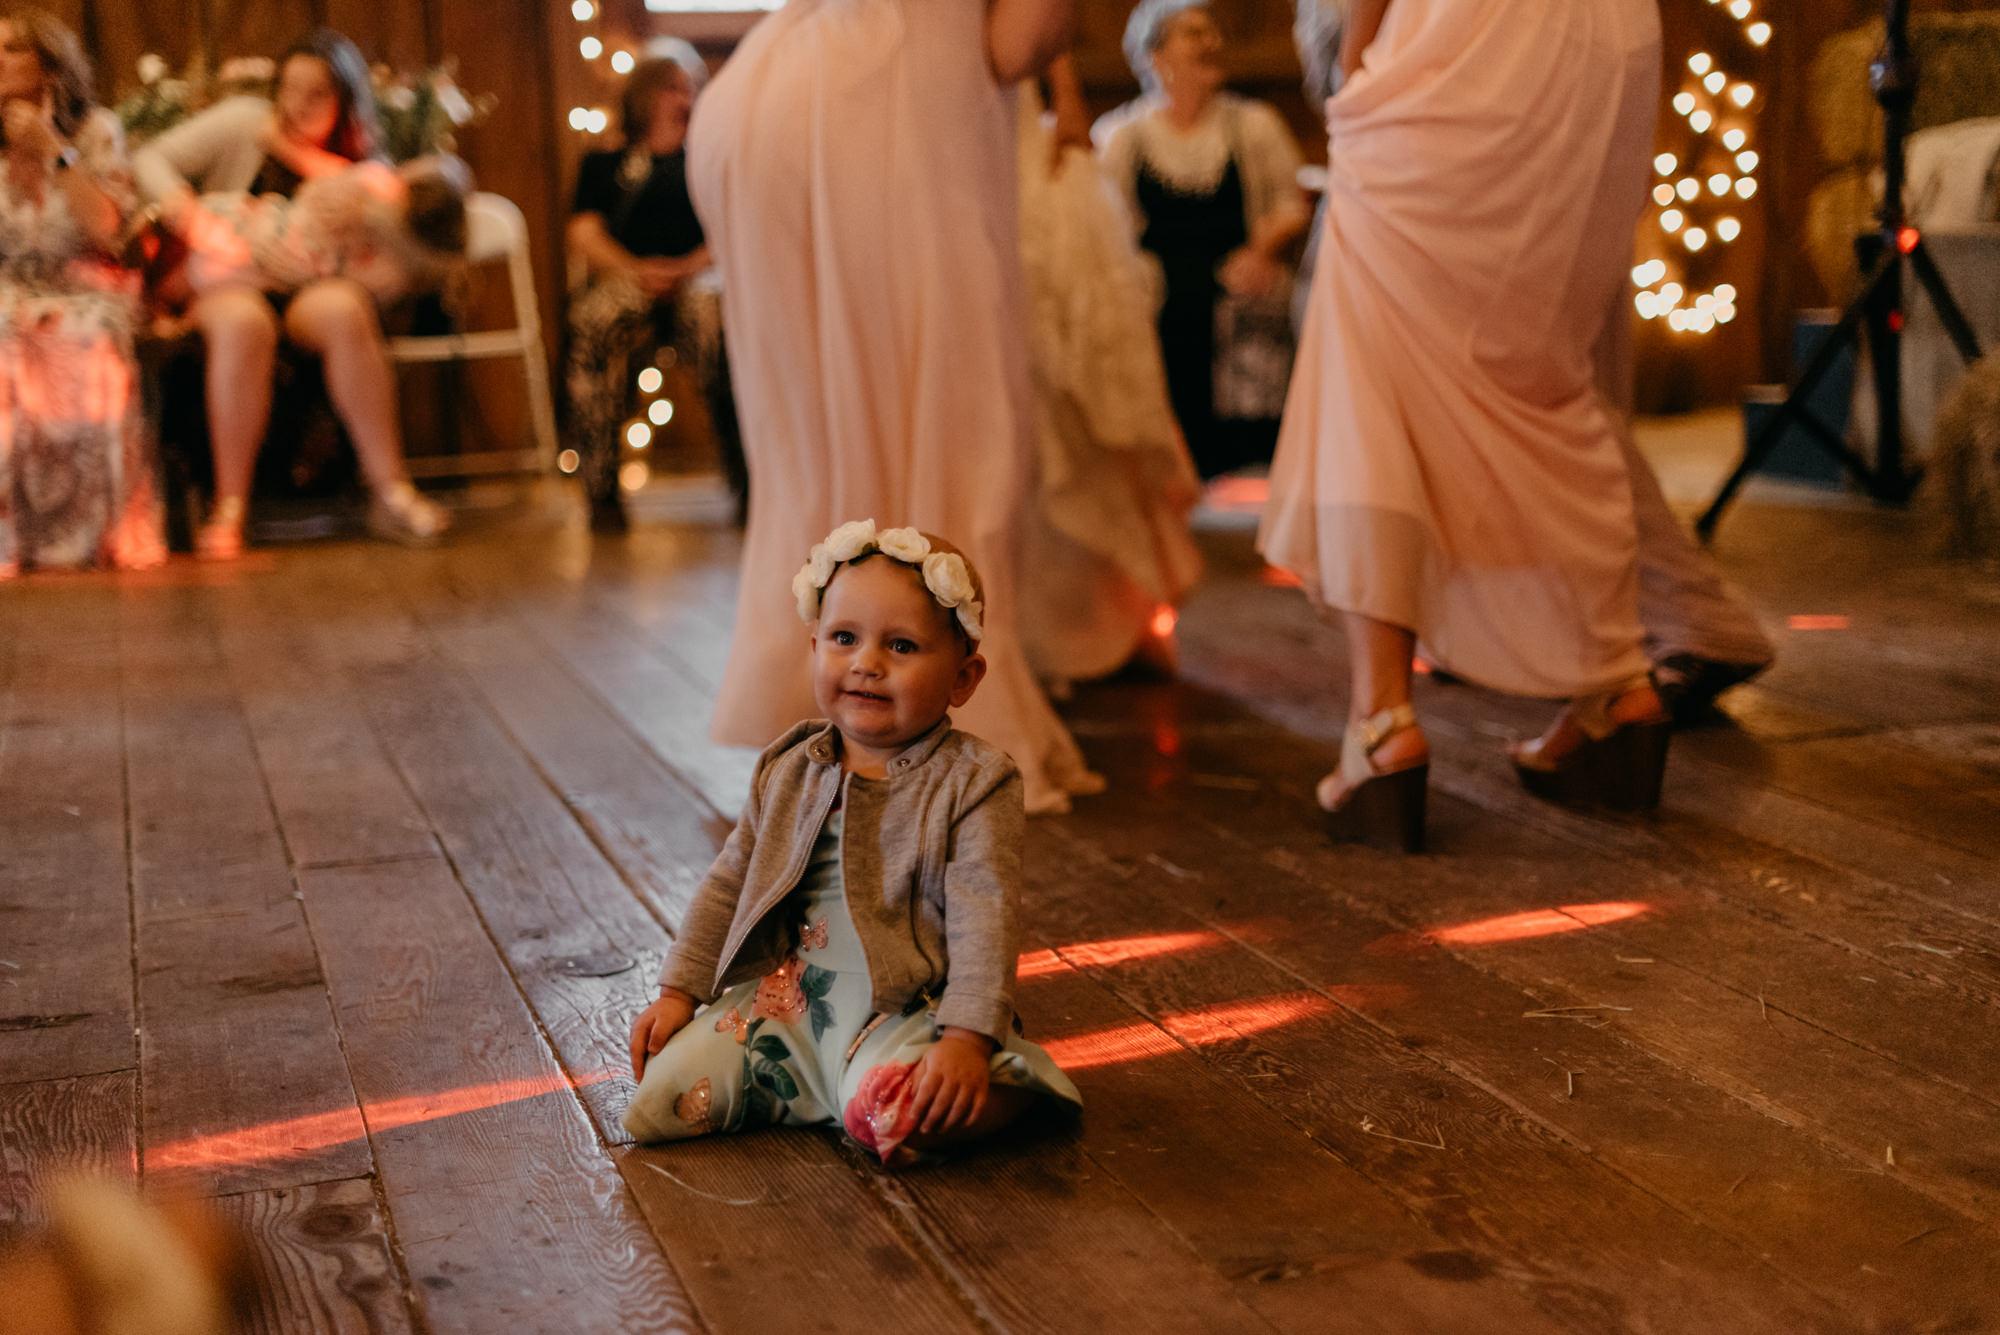 204-portland-northwest-wedding-bubble-exit-barn-string-lights.jpg